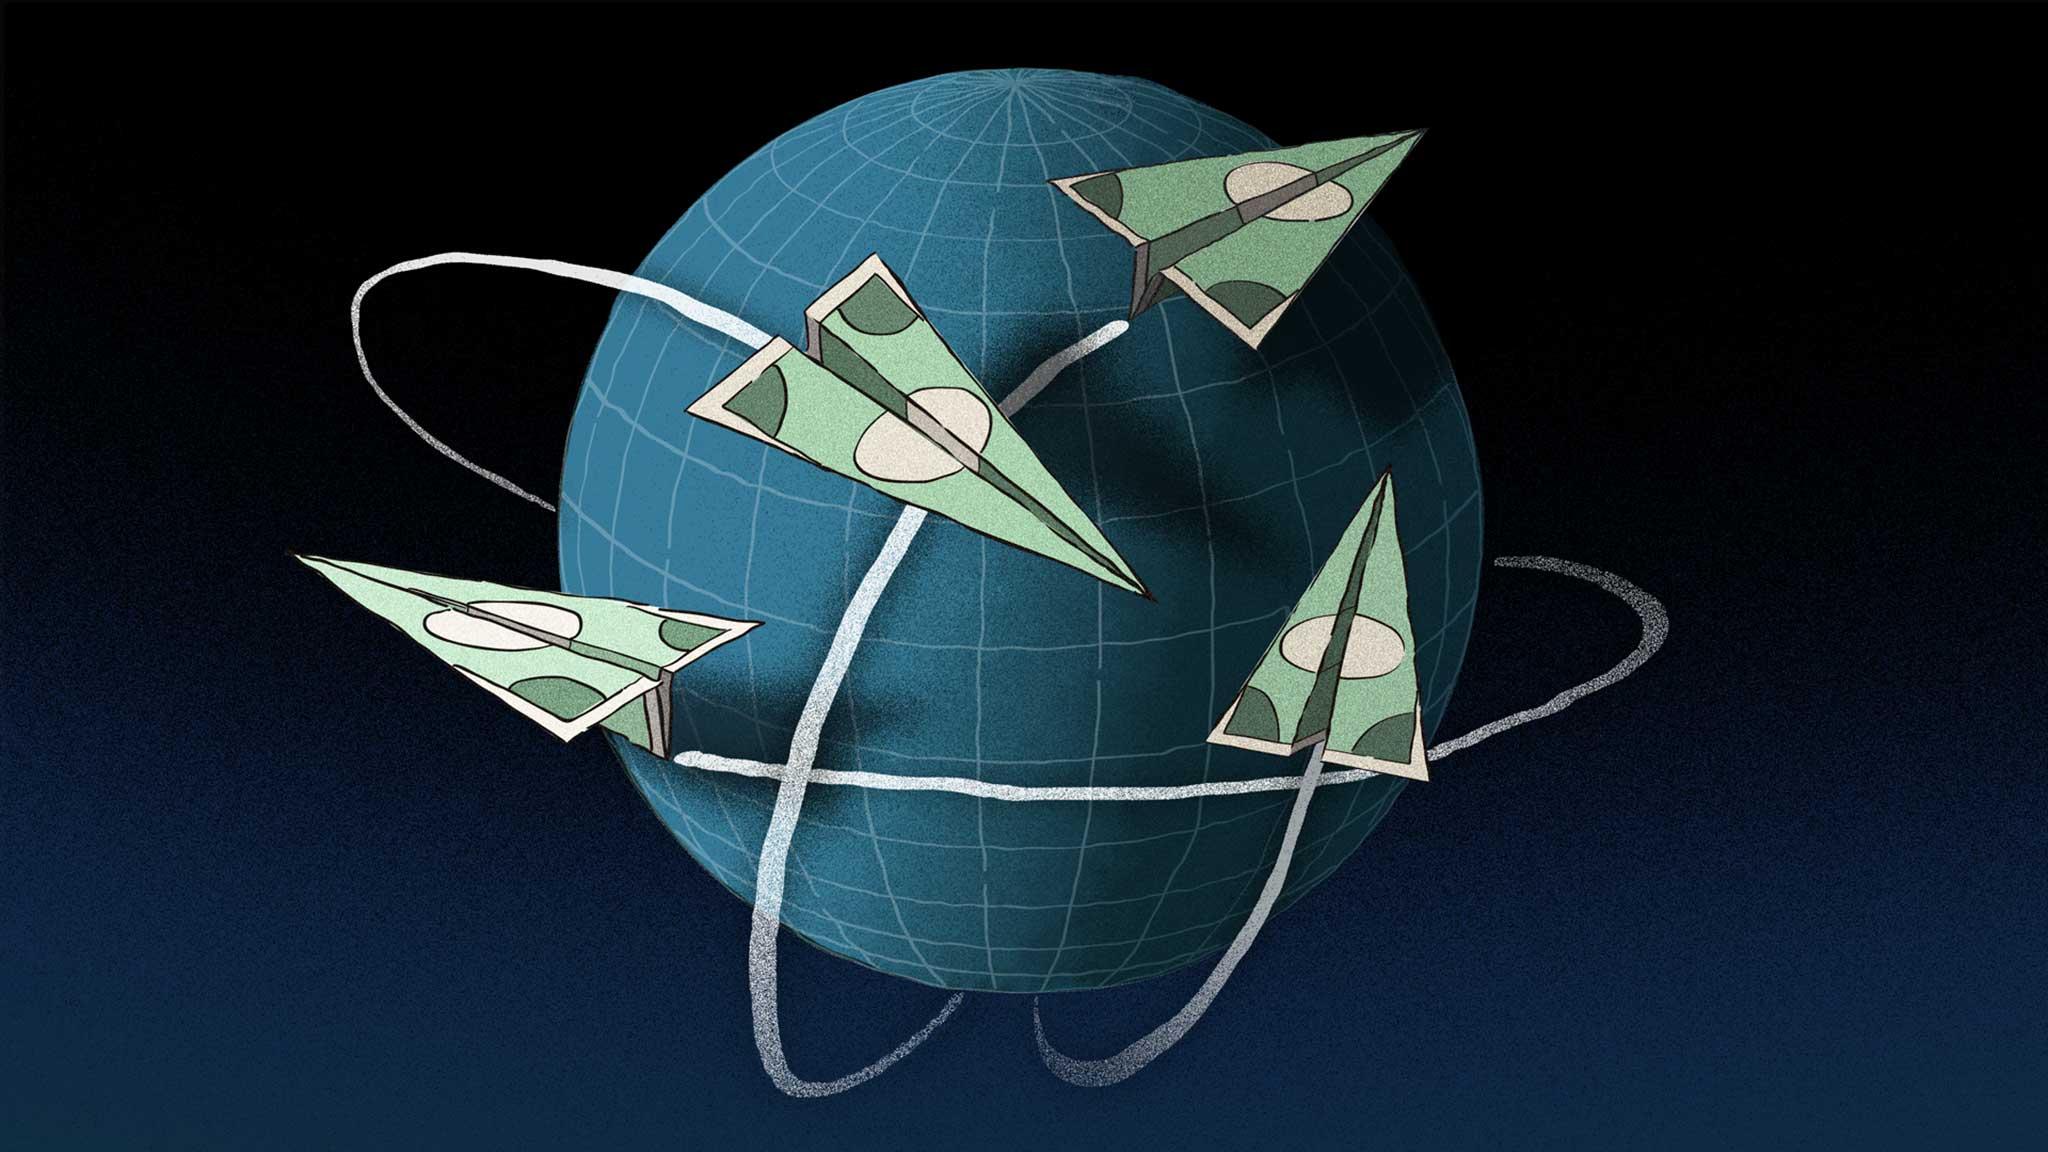 Fintech unicorn rewrites forex rules to snag big bank profits